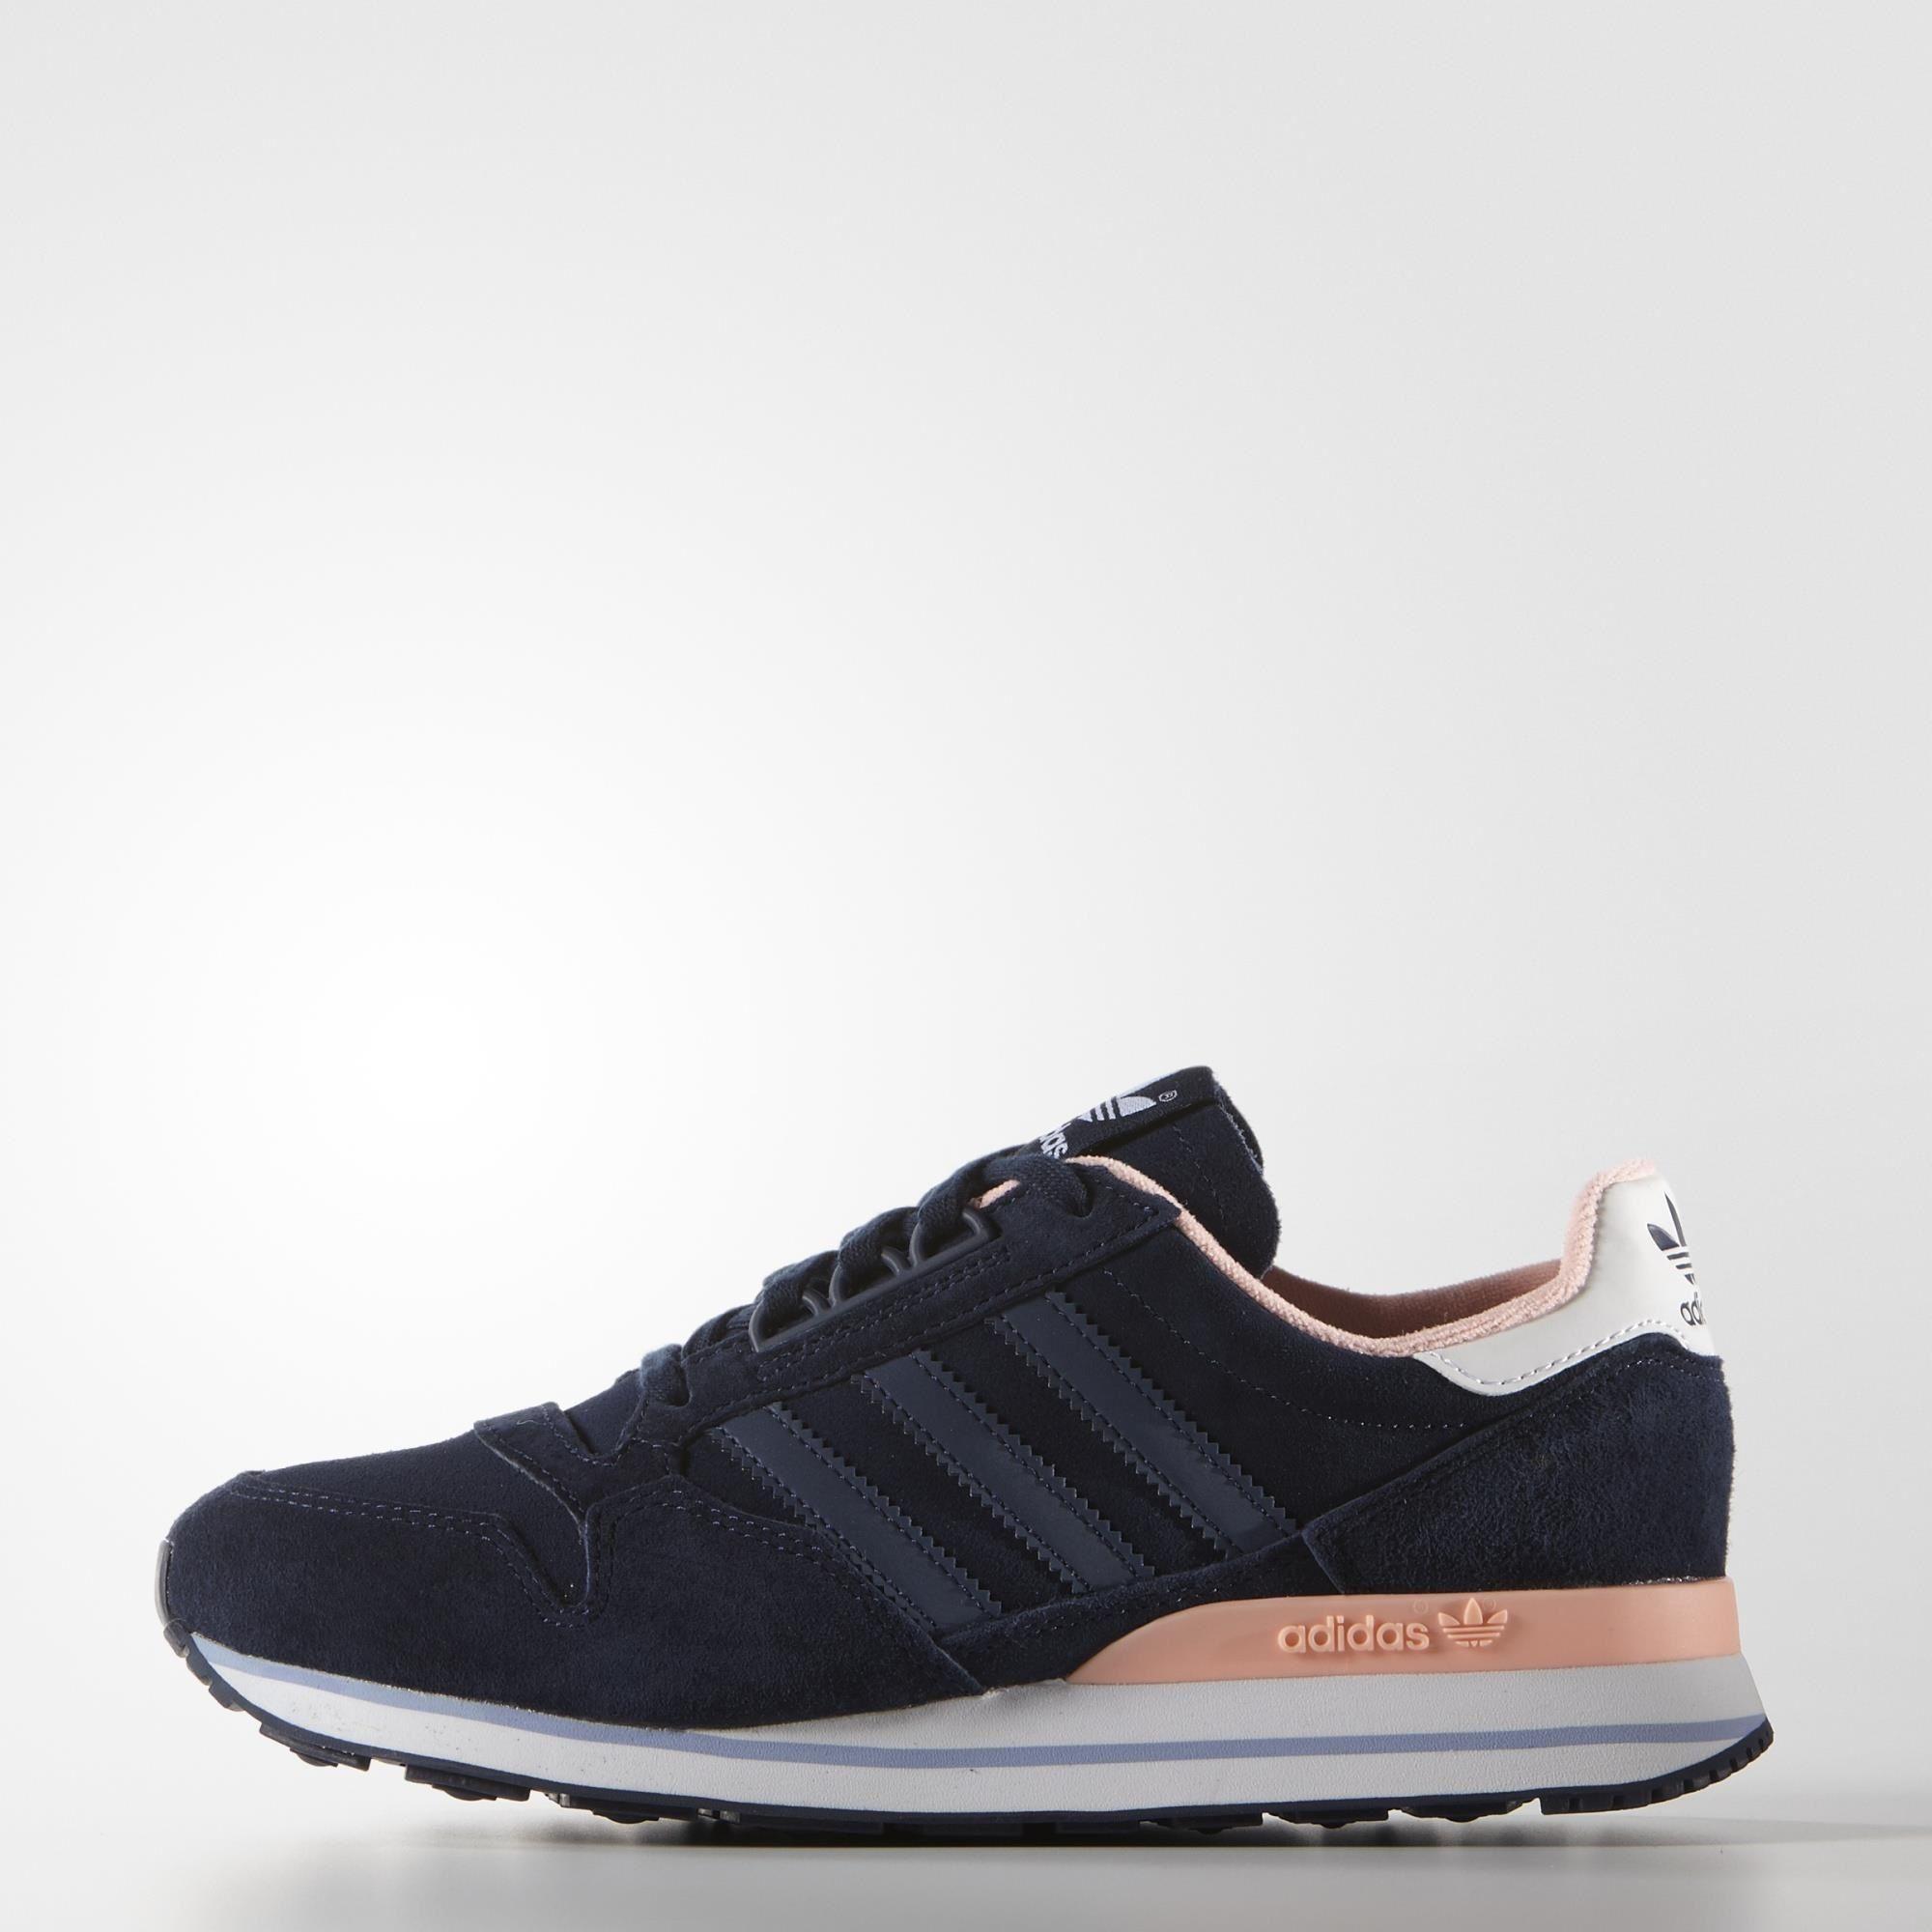 adidas chaussure zx 500